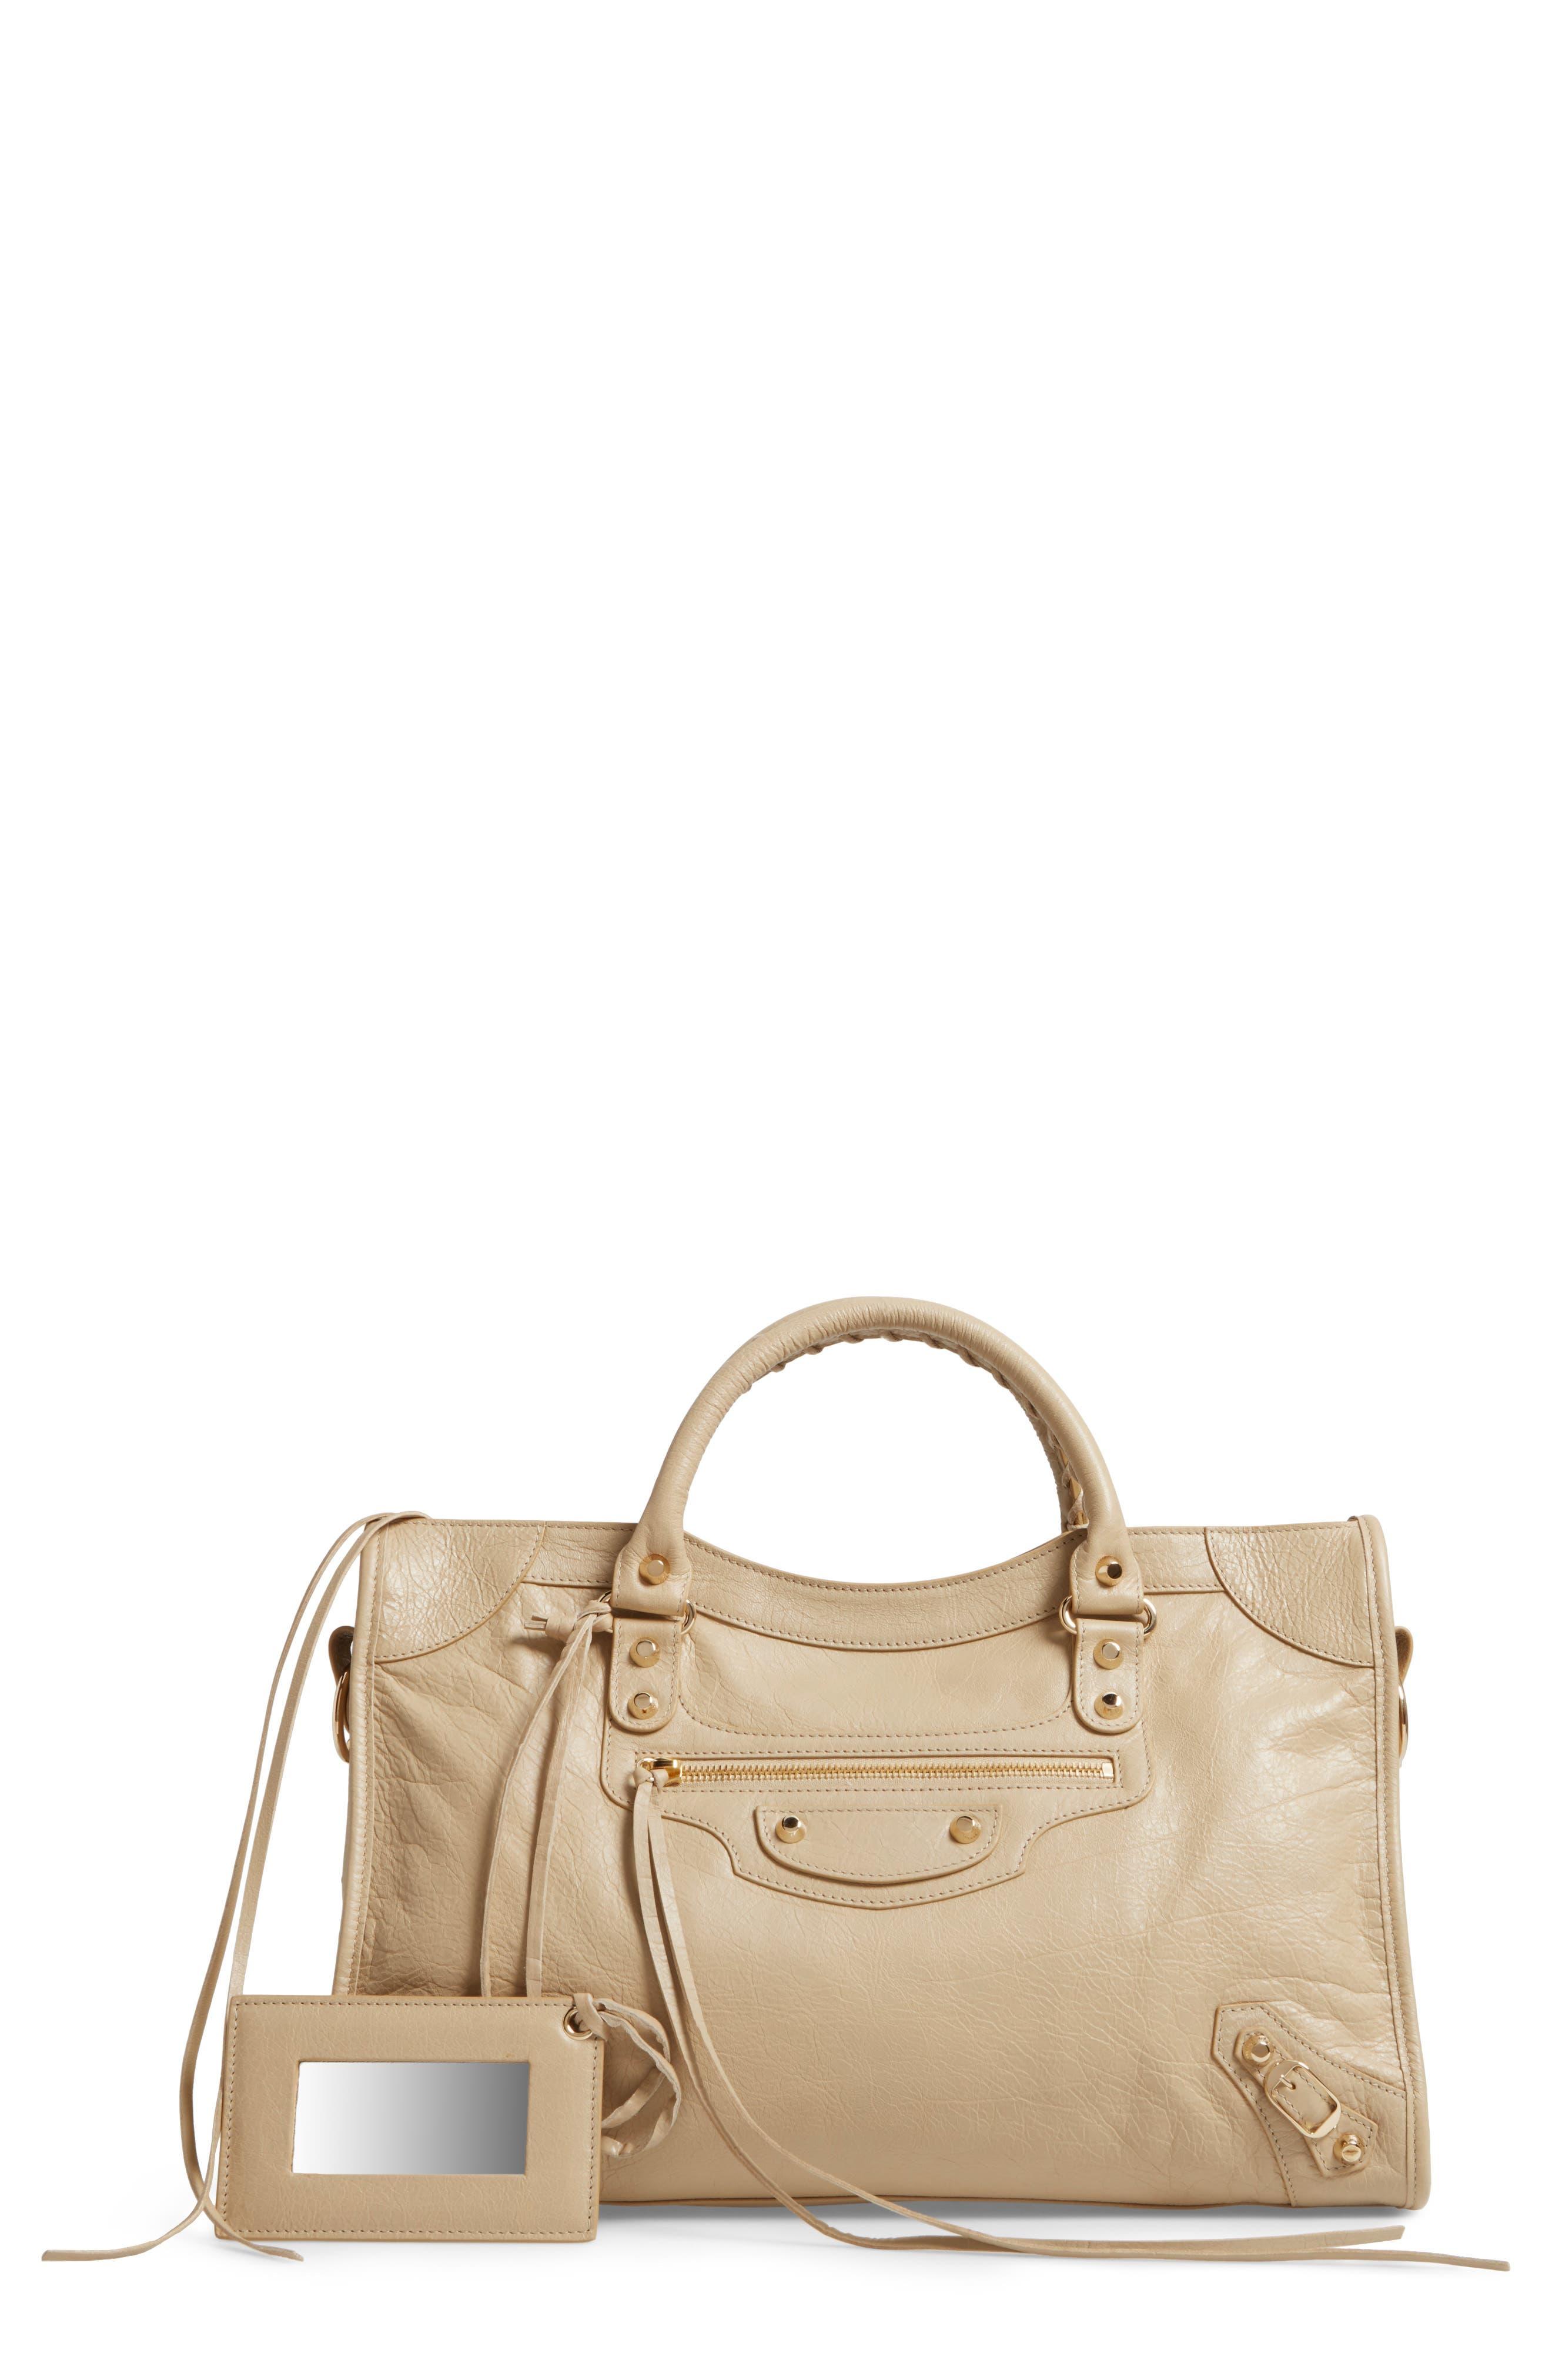 Main Image - Balenciaga Classic City Bag